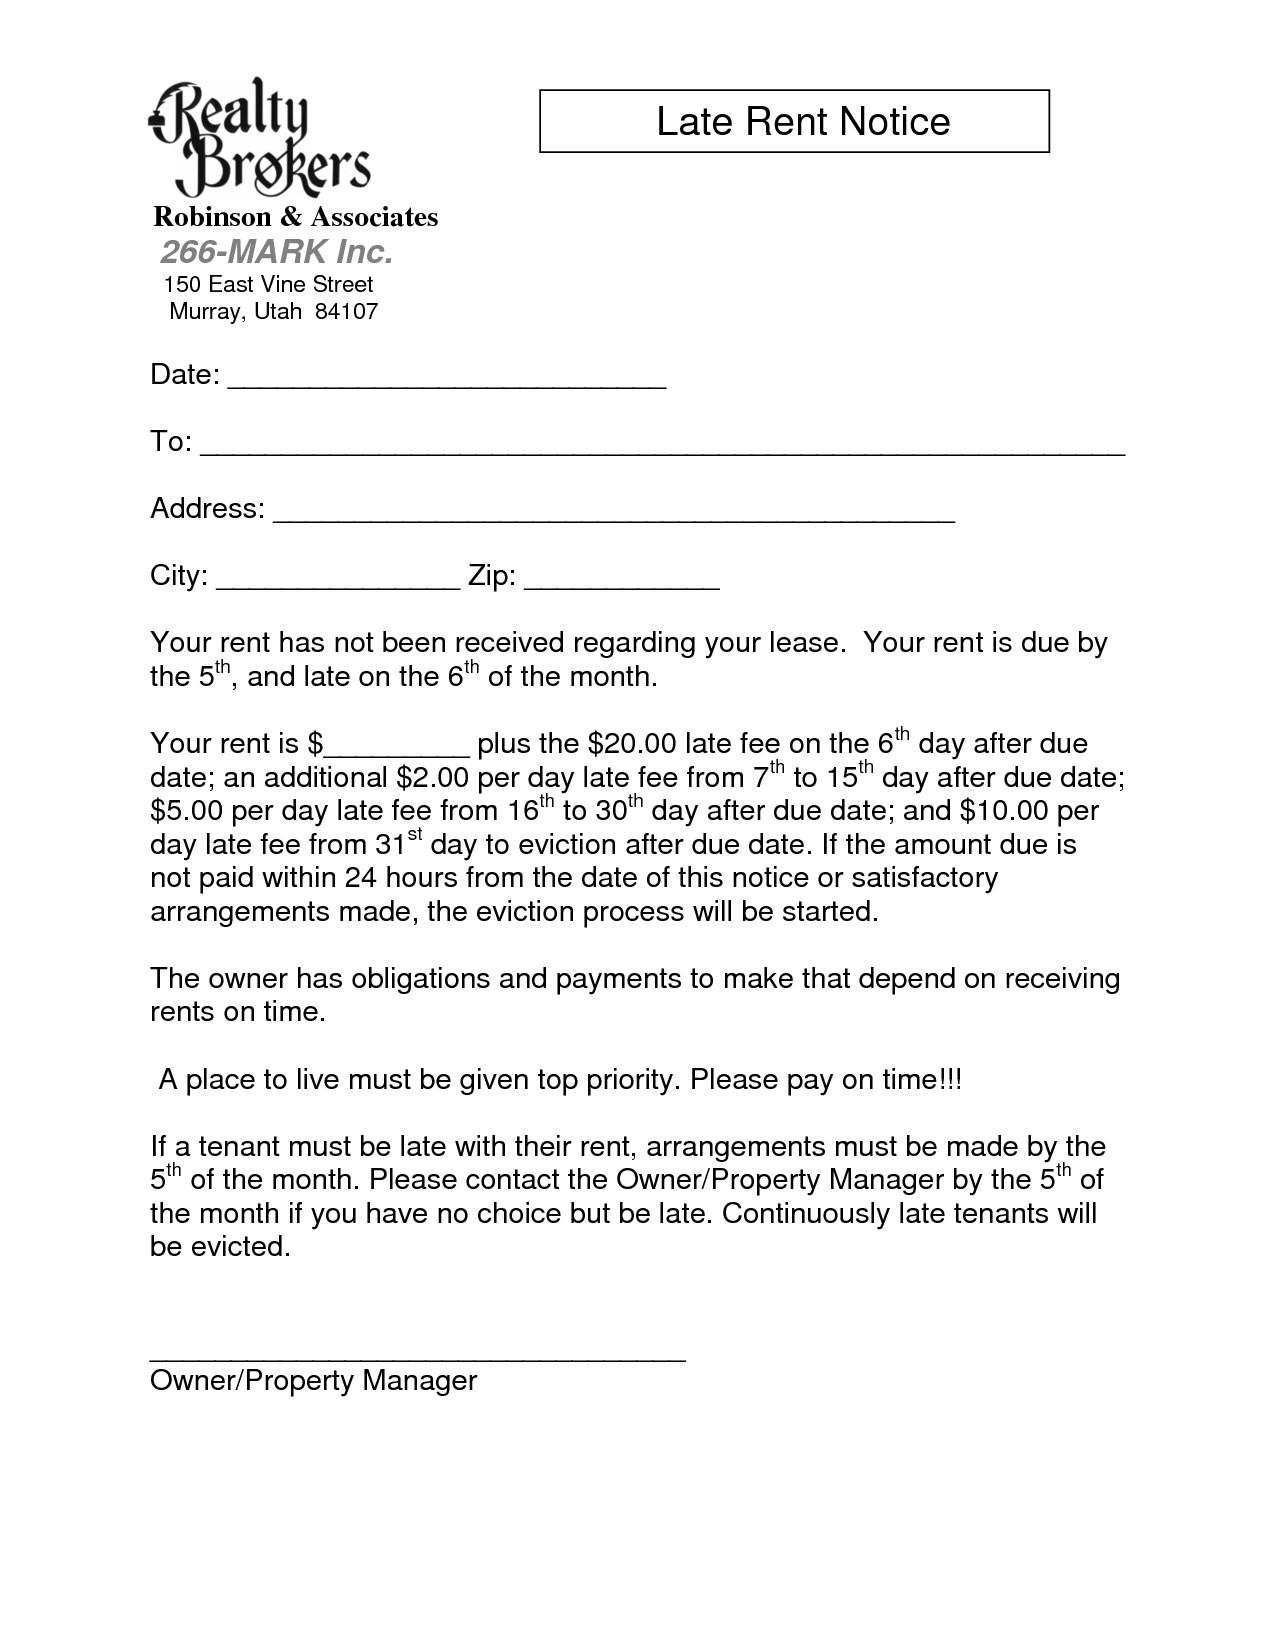 Late Rent Notice Template Late Rent Notice Template Images Sample Late Rent Notice